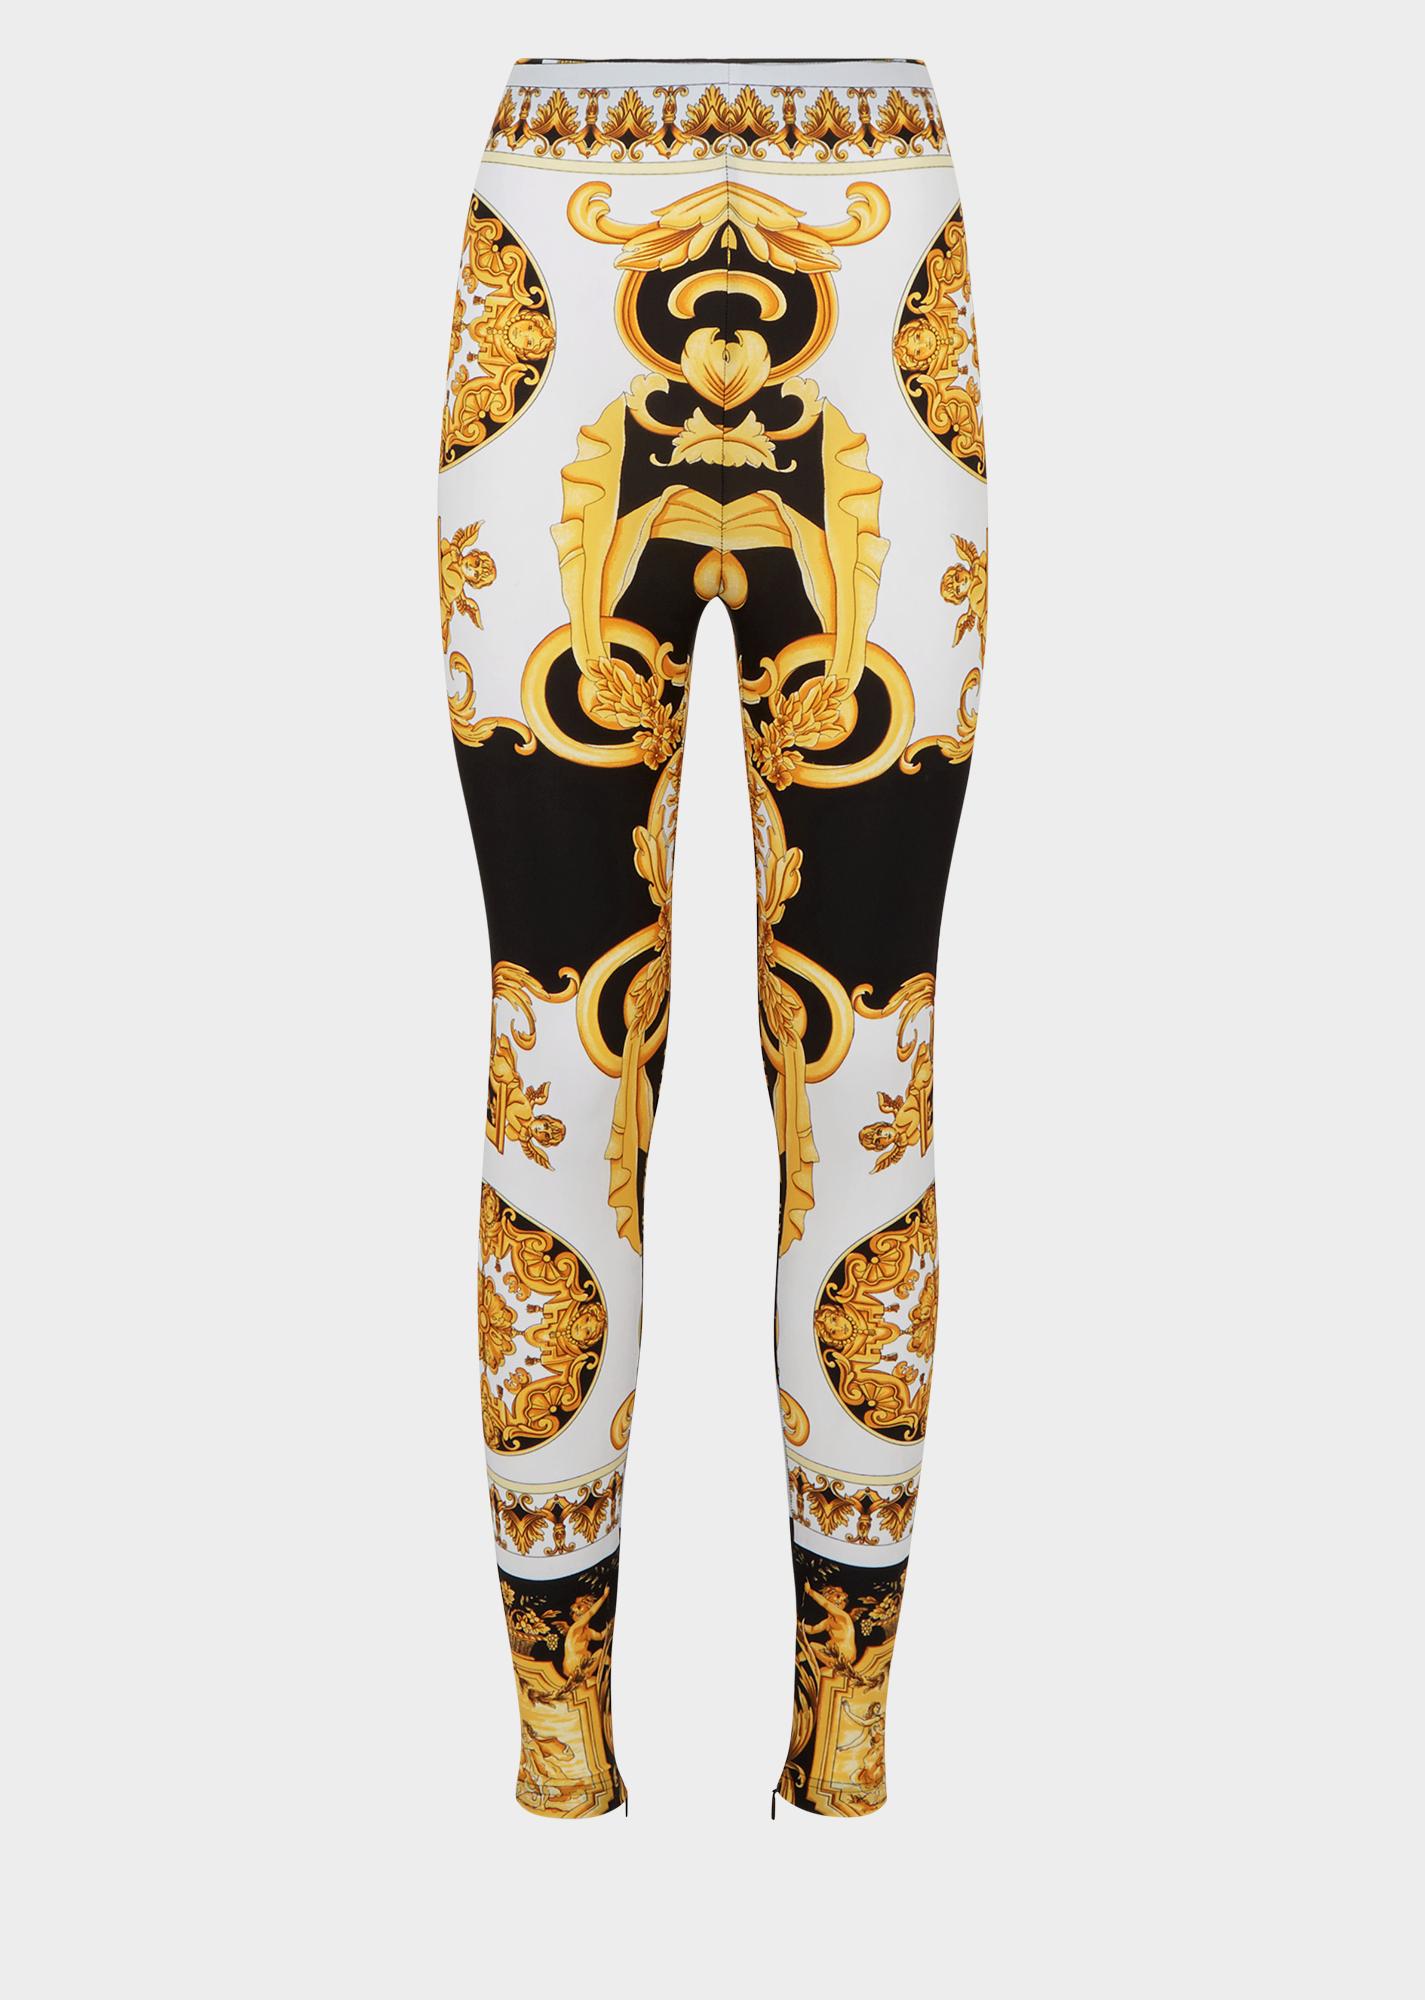 80a082a0b8 Versace - SS2018 | Barocco SS'92 Print Leggings | PANTS/SHORTS in ...